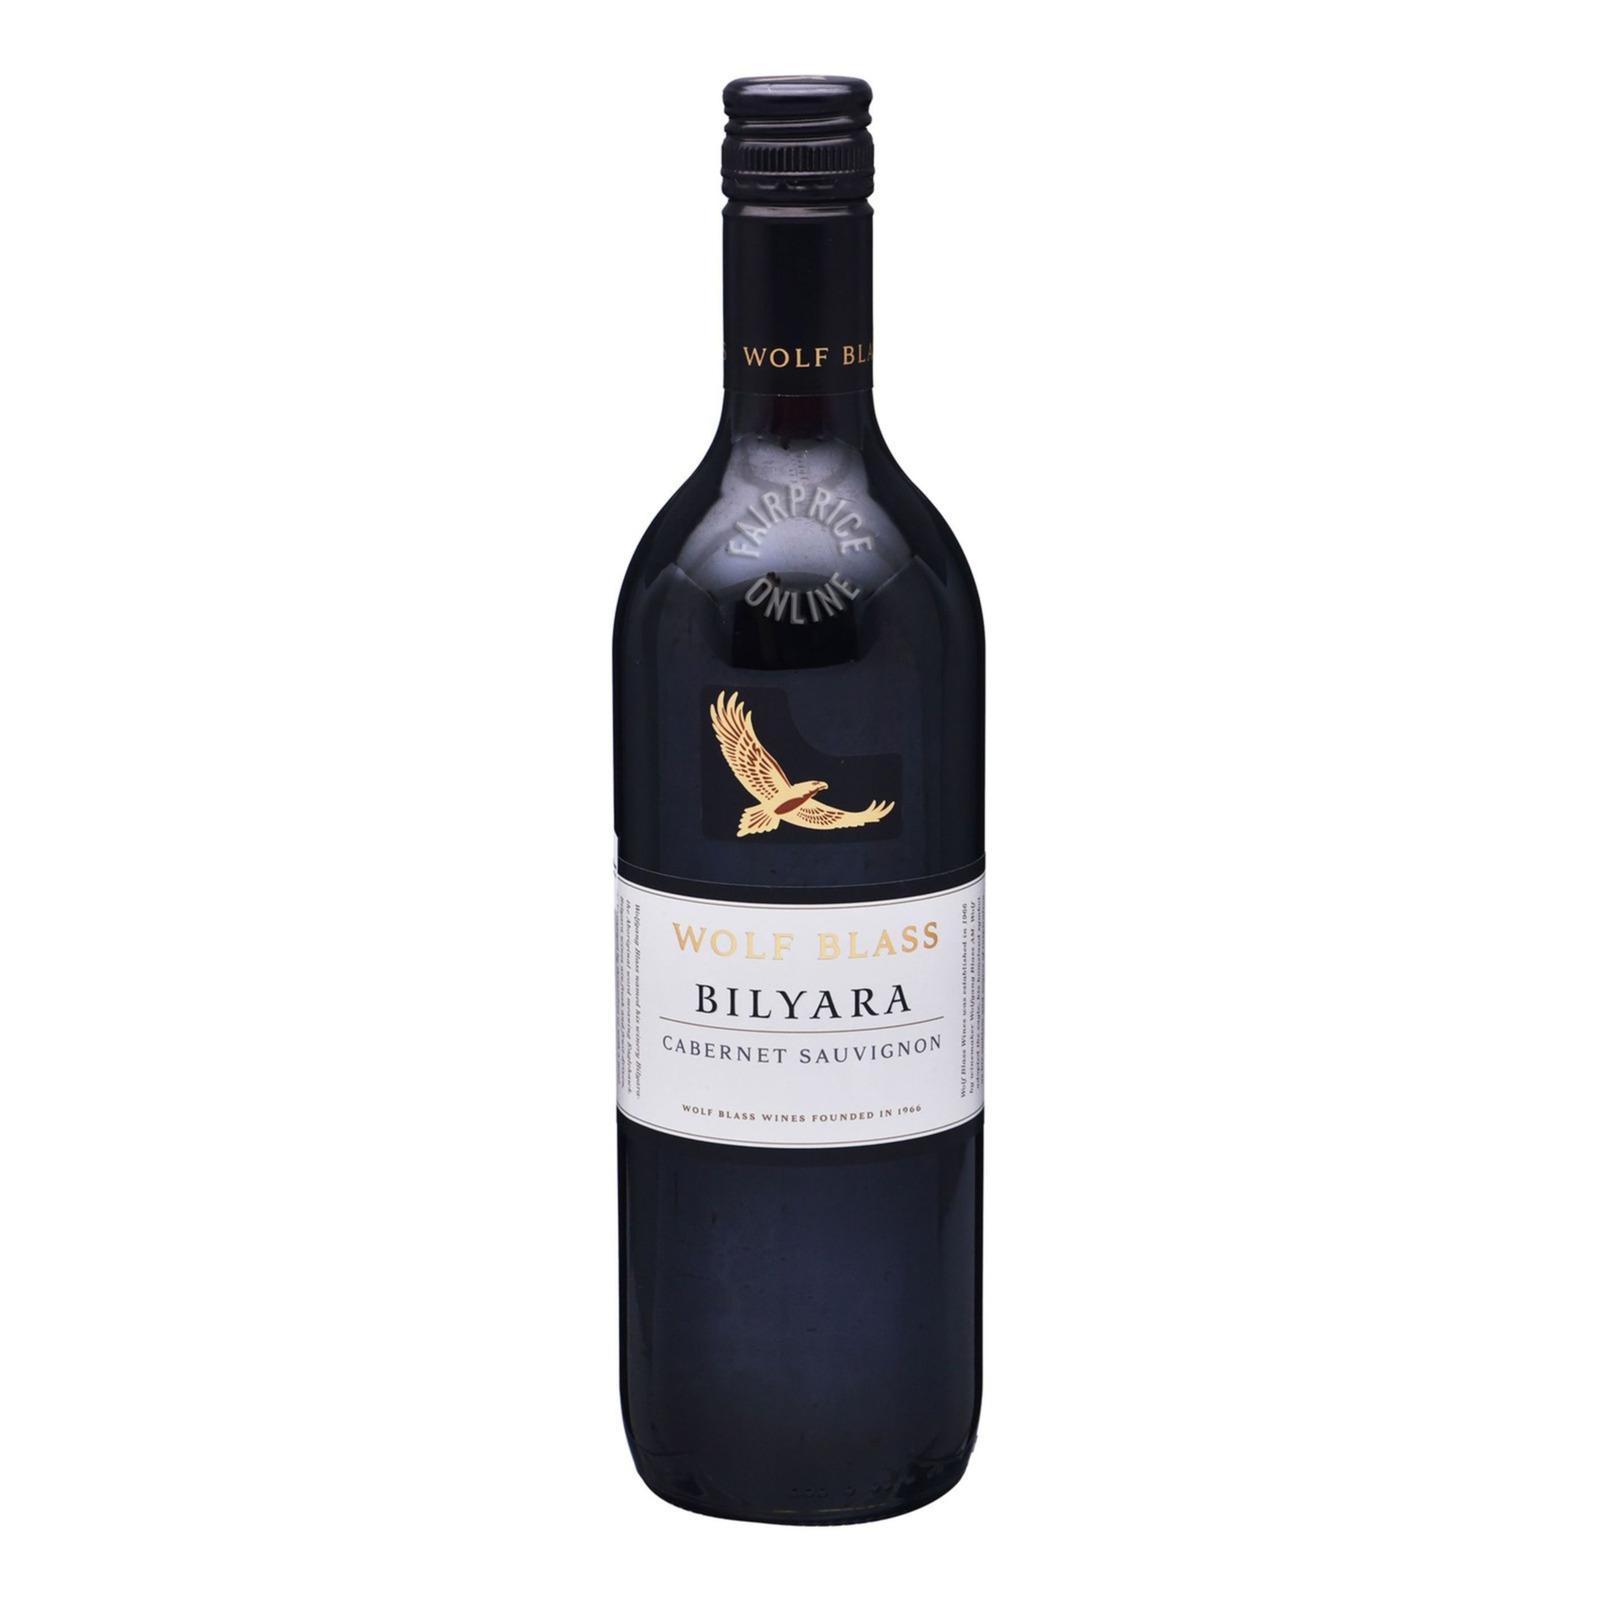 Wolf Blass Bilyara Red Wine - Cabernet Sauvignon